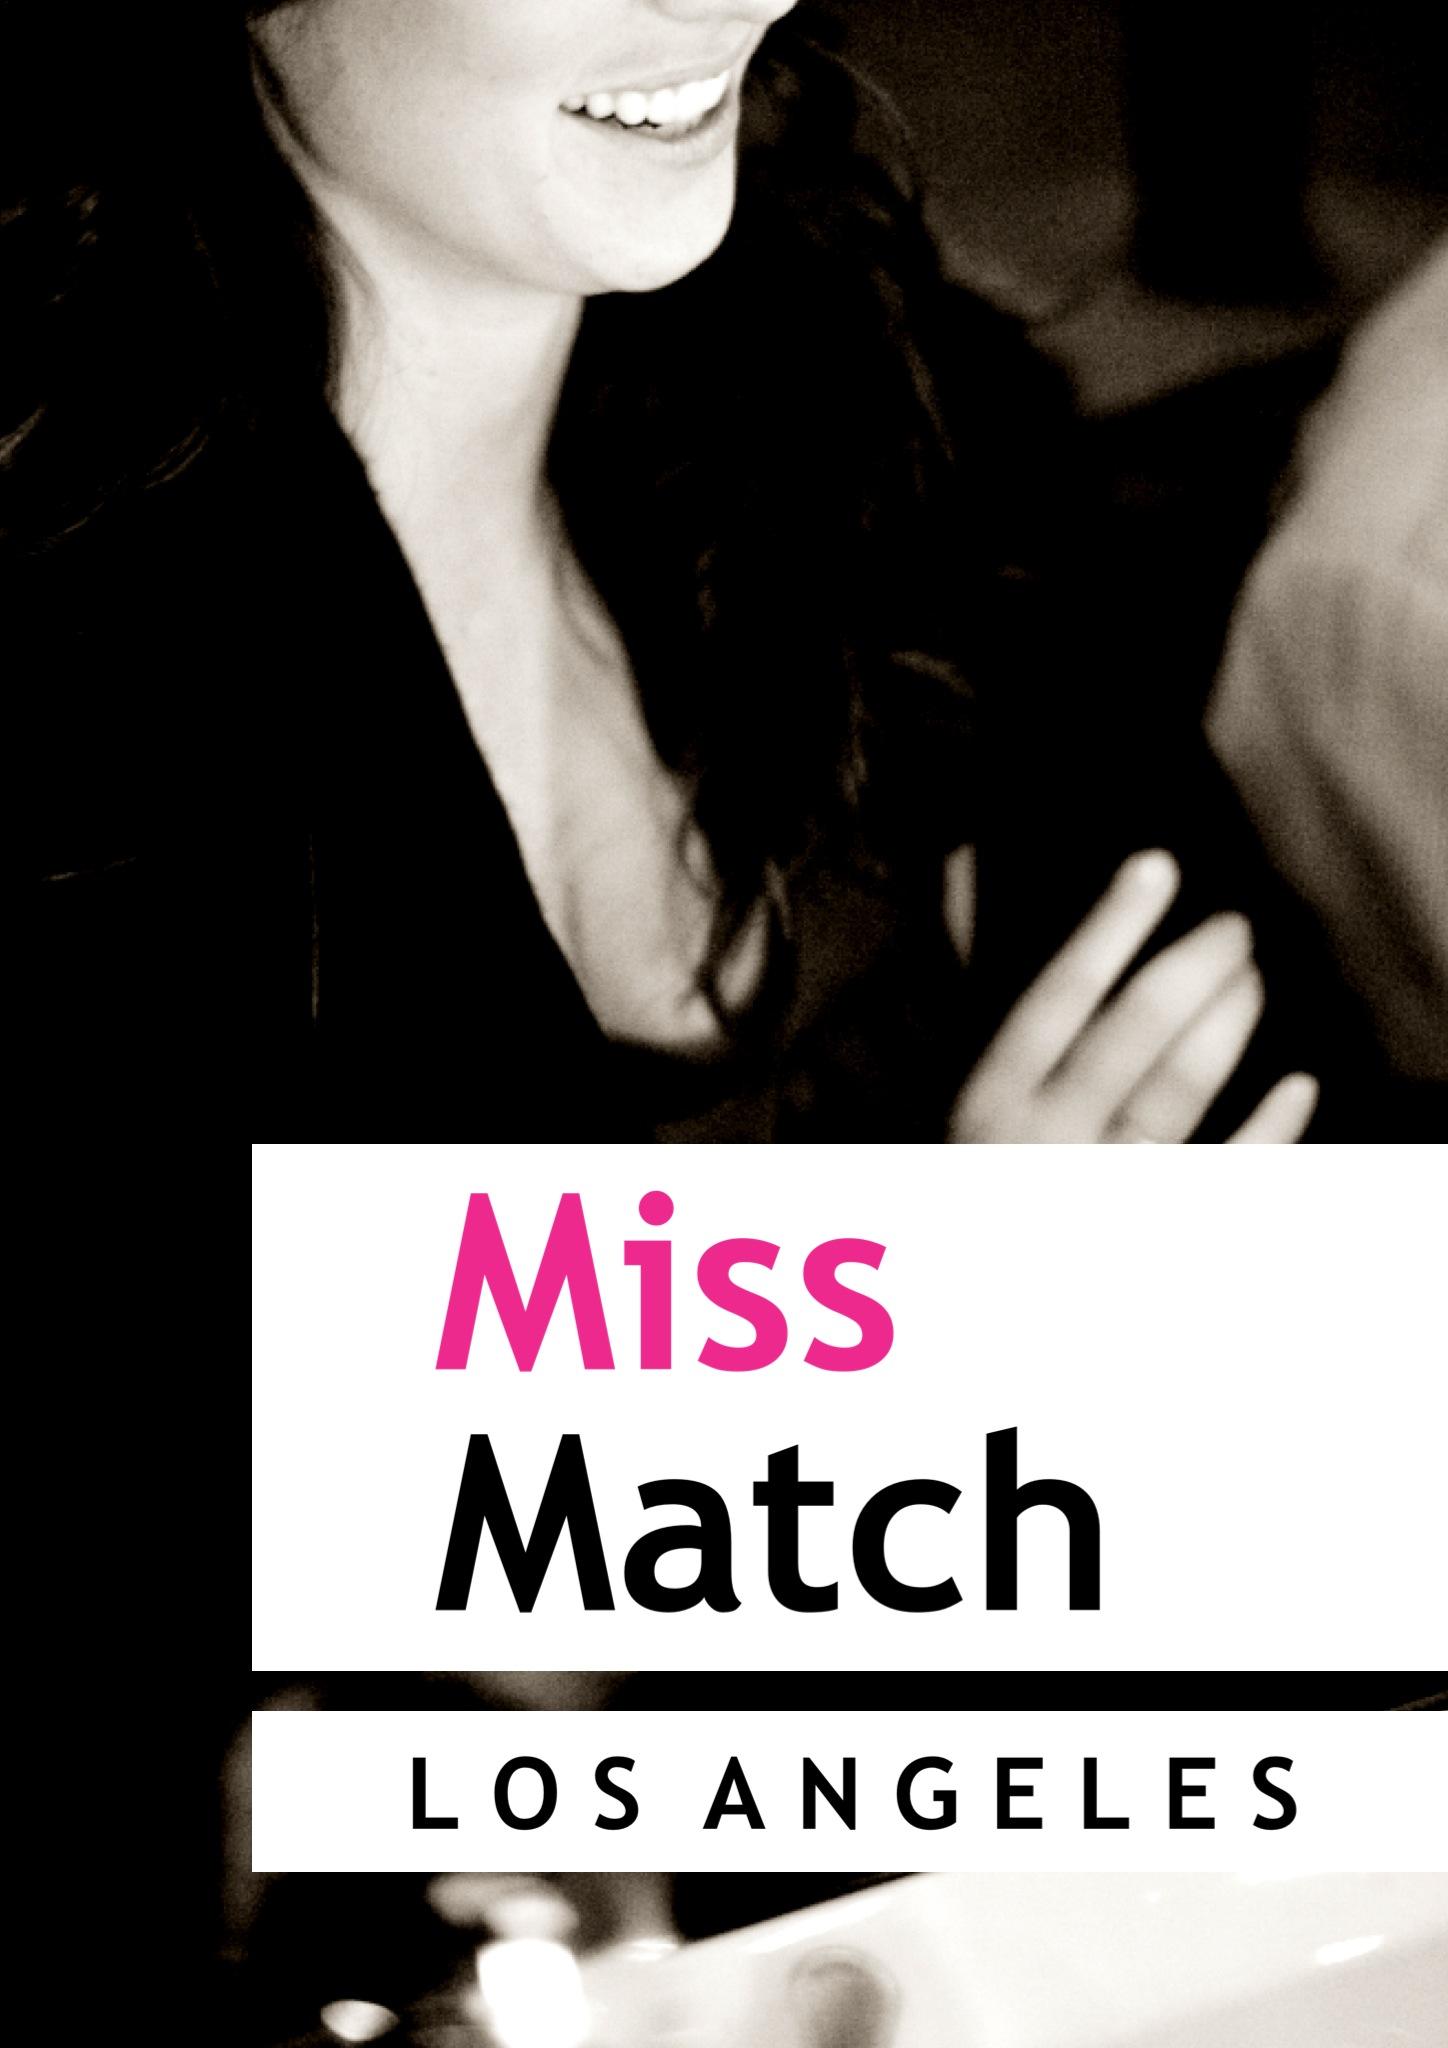 Miss Match LA